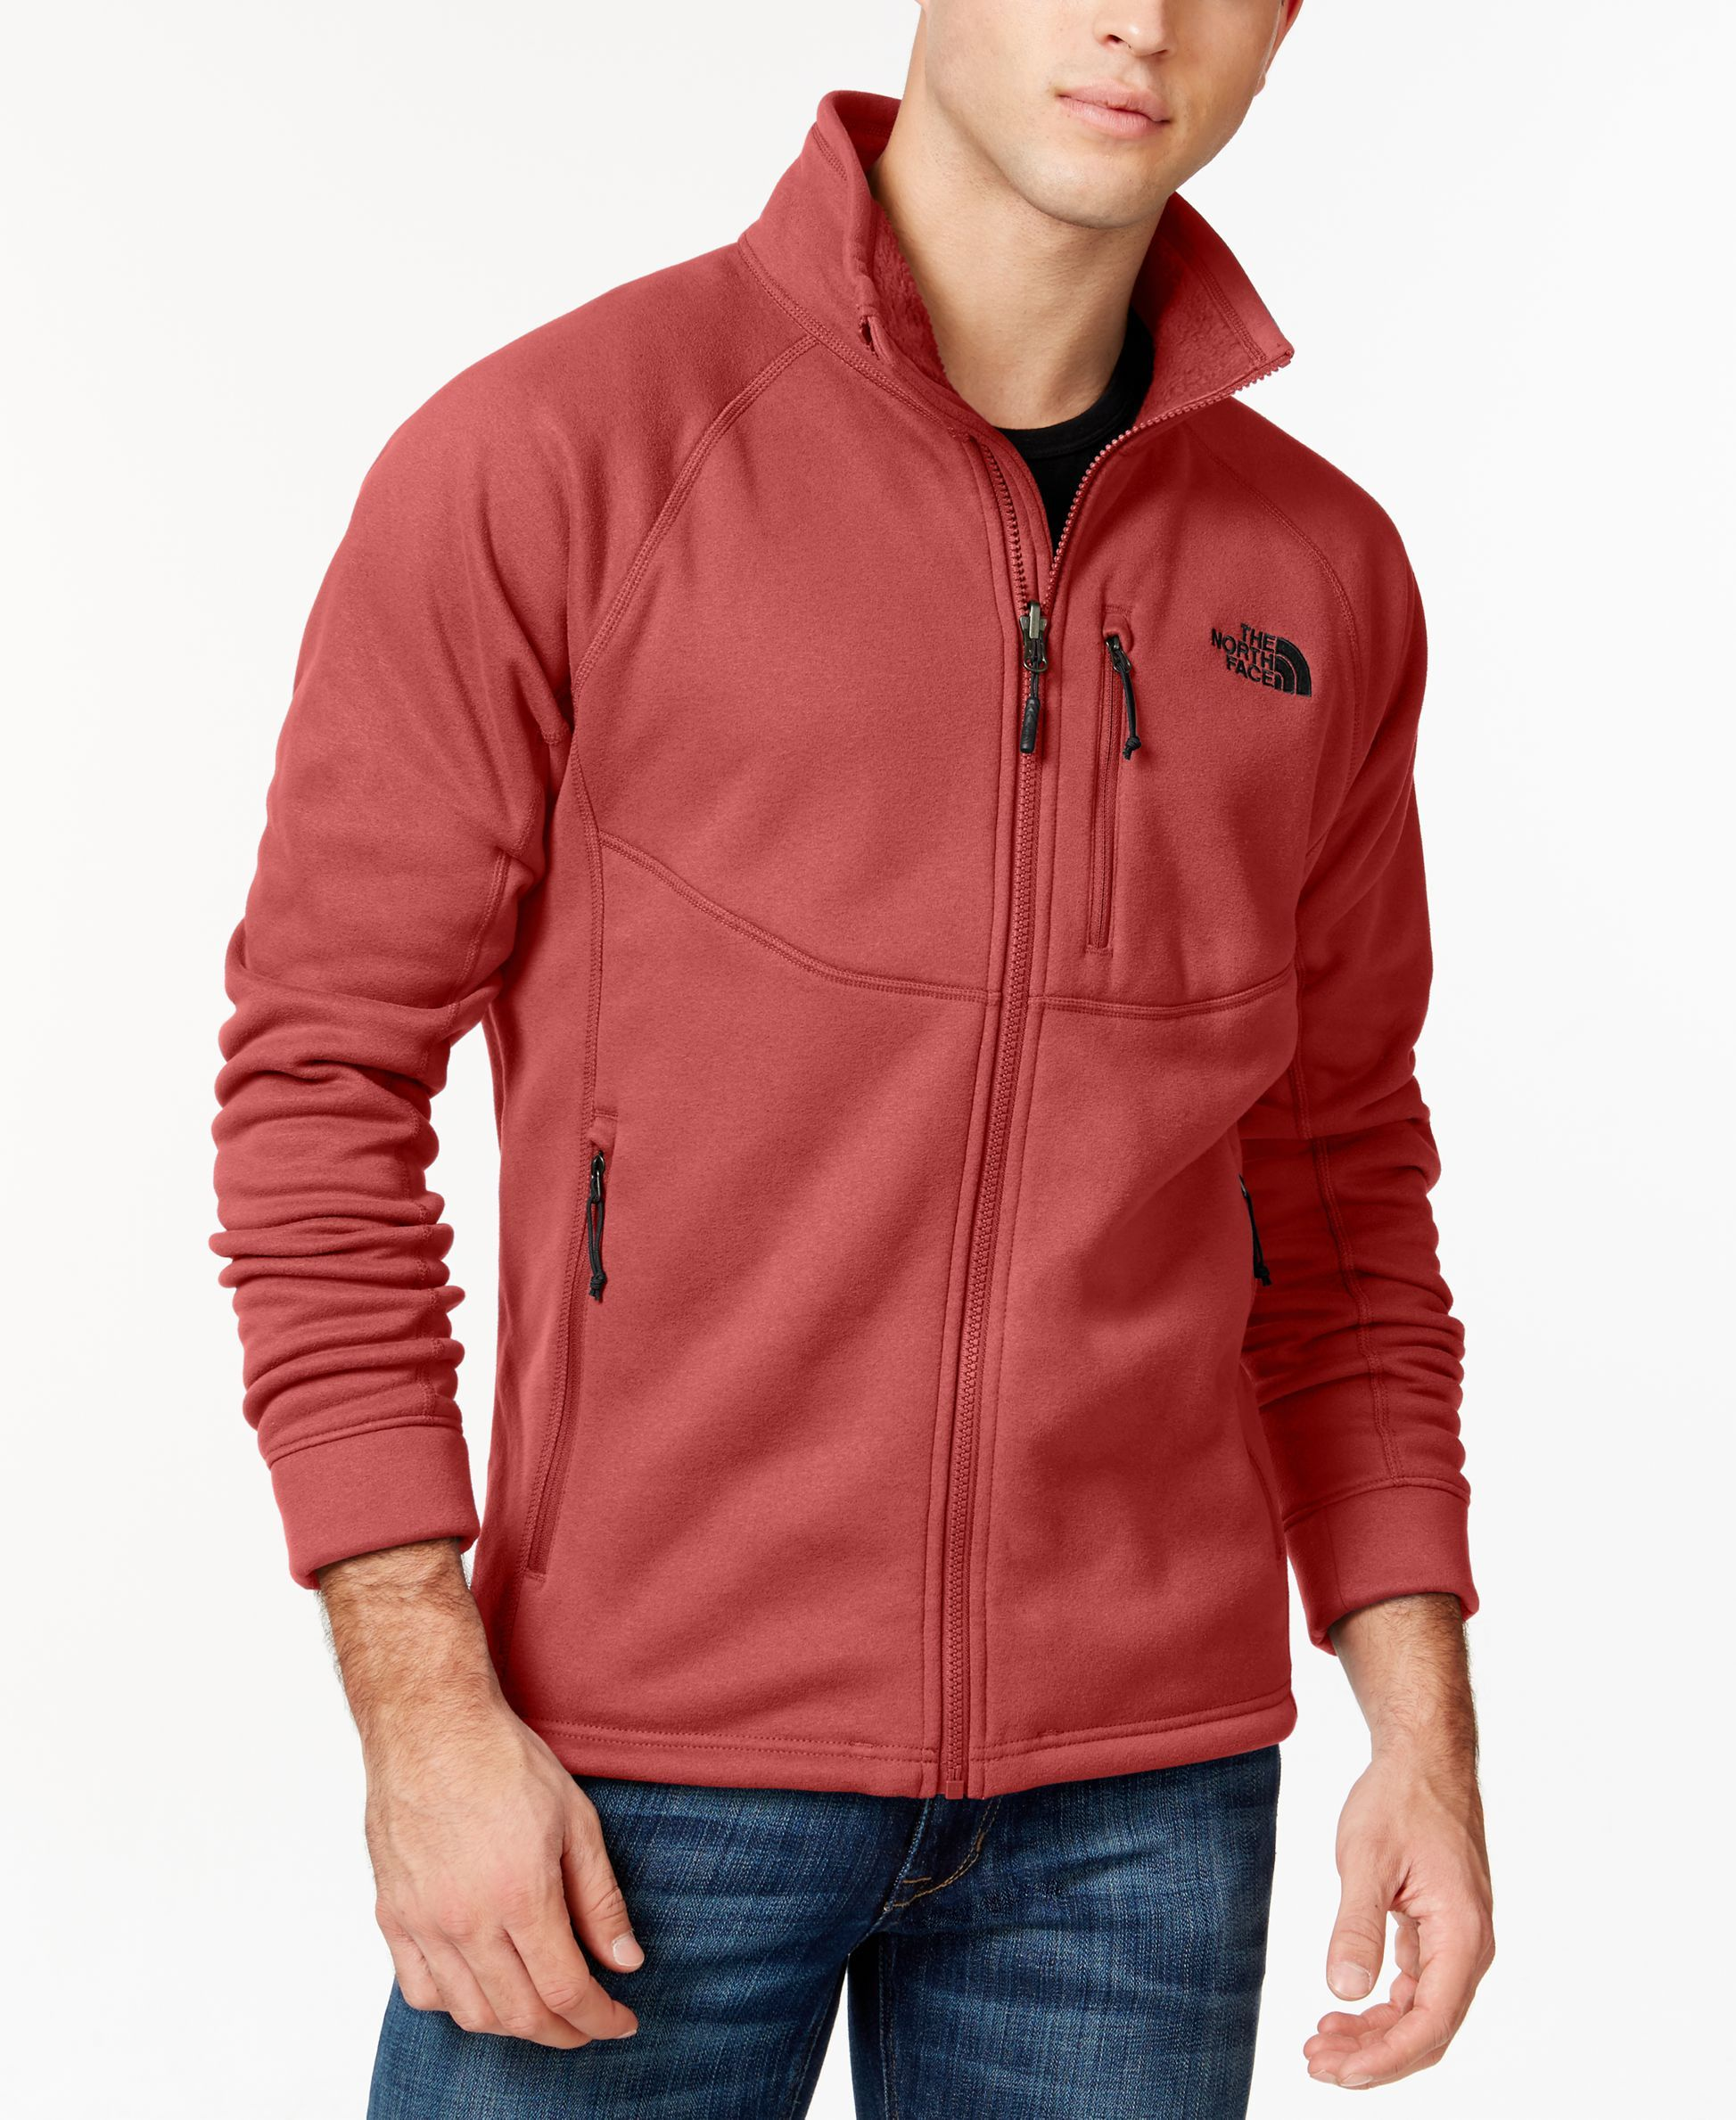 12073011af08 The North Face Timber Full-Zip Fleece Jacket